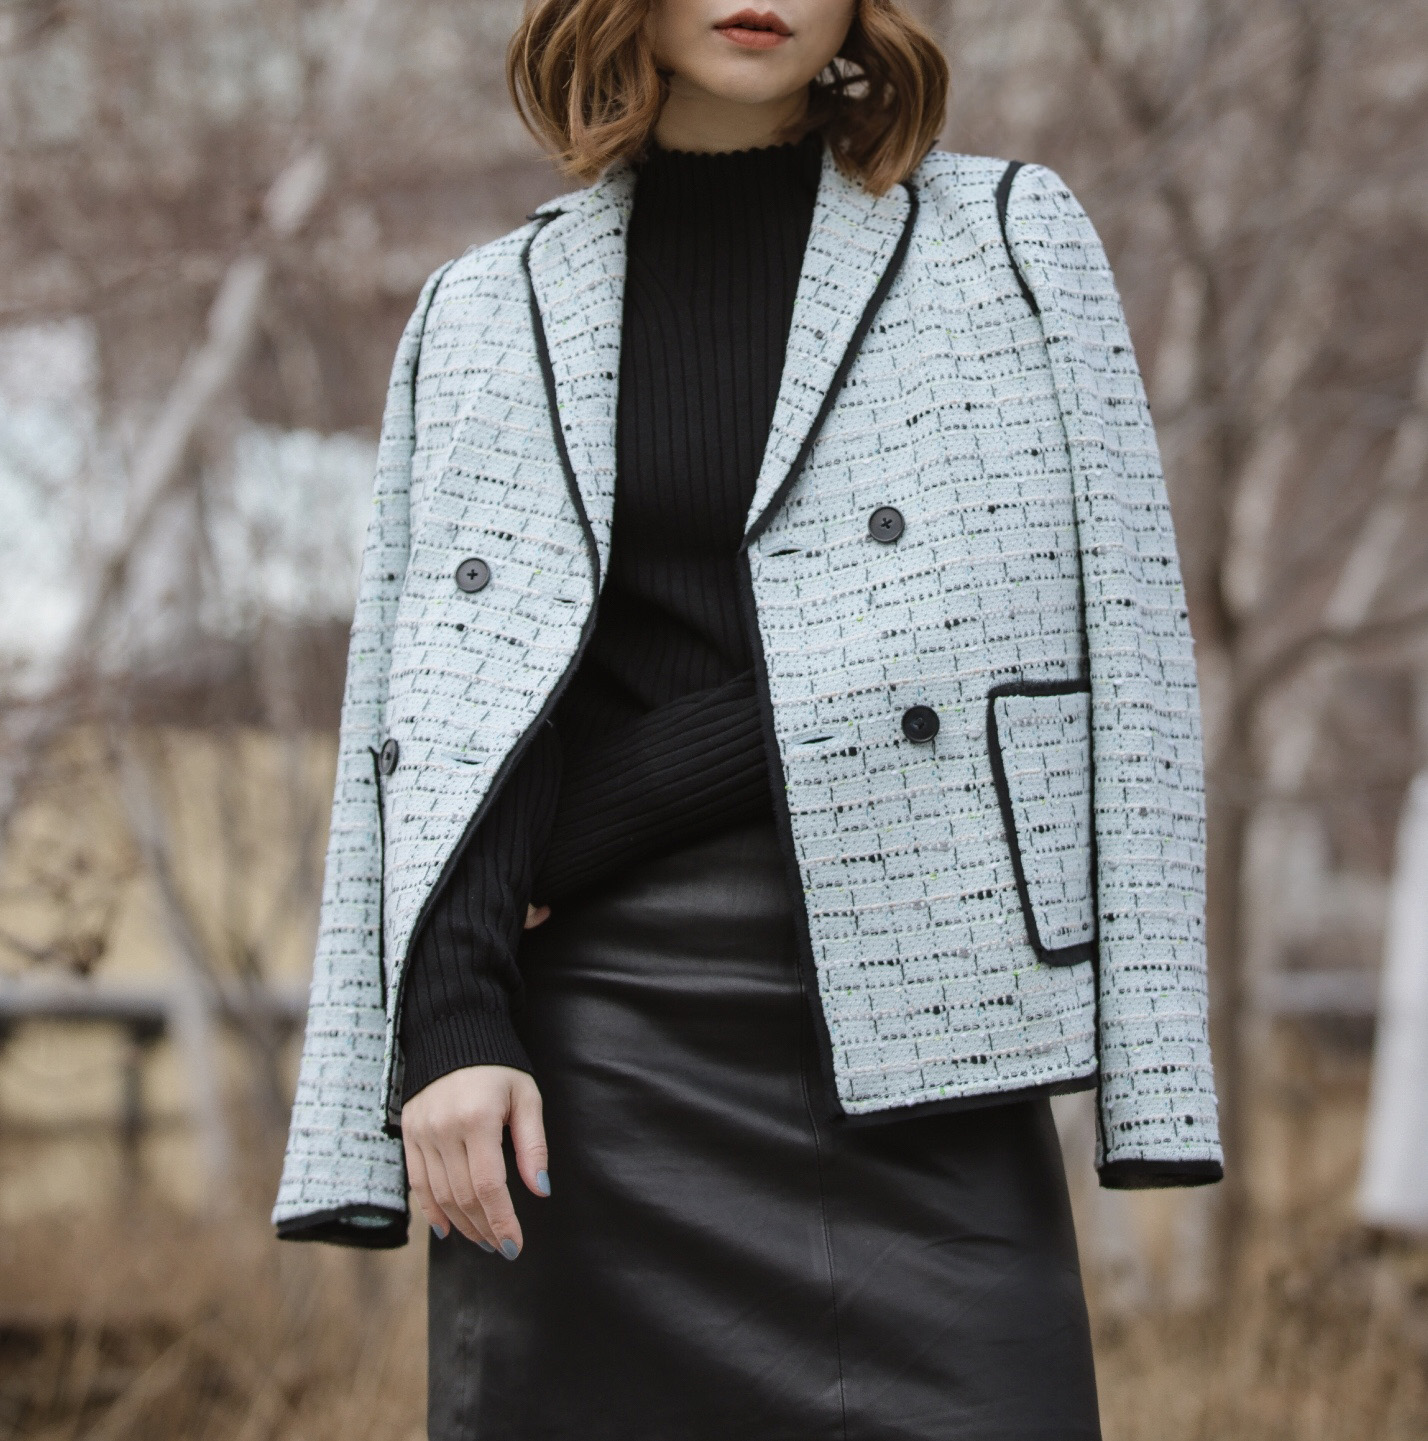 st john knits adriana multi tweed jacket tcurate.jpg